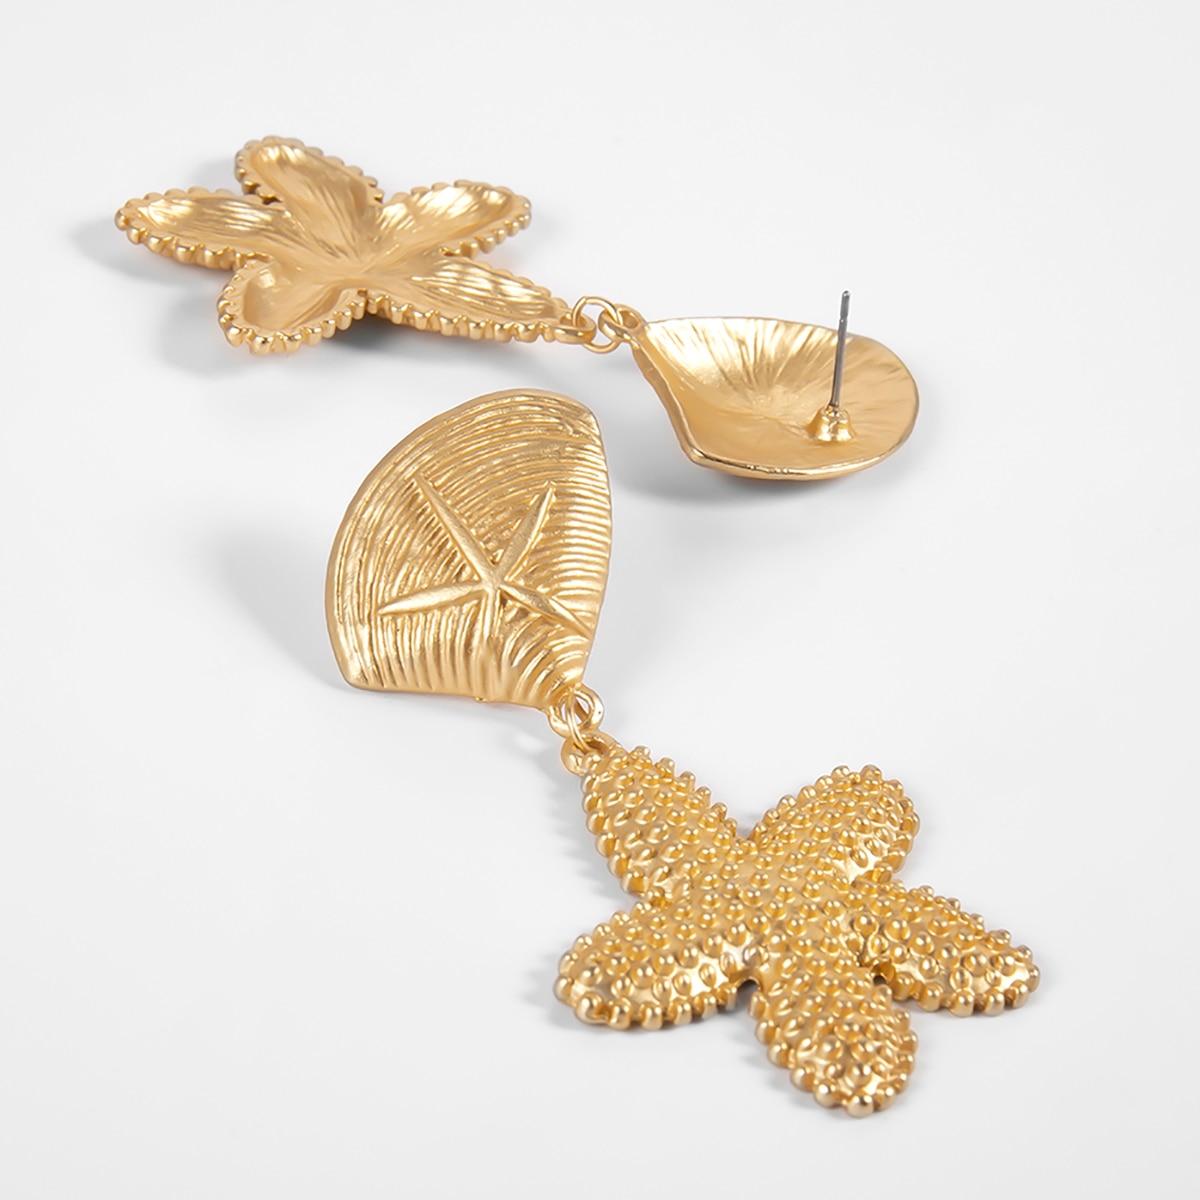 SHIXIN 2019 Korean Fashion Gold Color Starfish Earrings Statement Sea Star Shell Drop Earrings for Women Summer Earings Jewelry in Drop Earrings from Jewelry Accessories